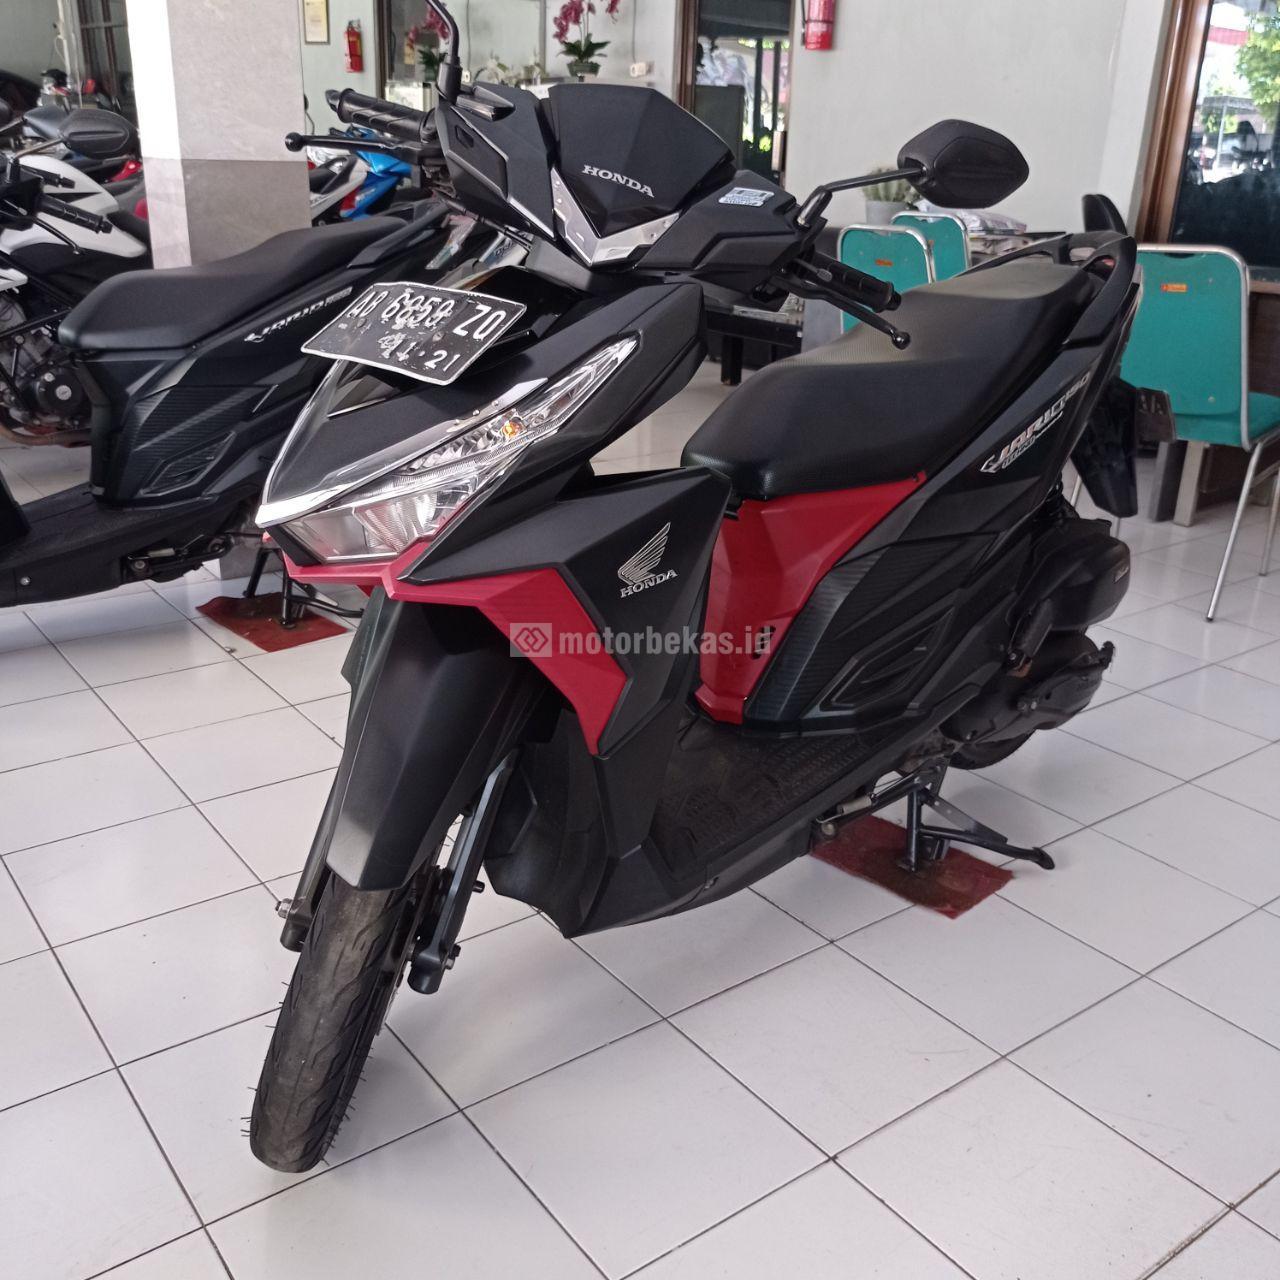 HONDA VARIO 150  418 motorbekas.id